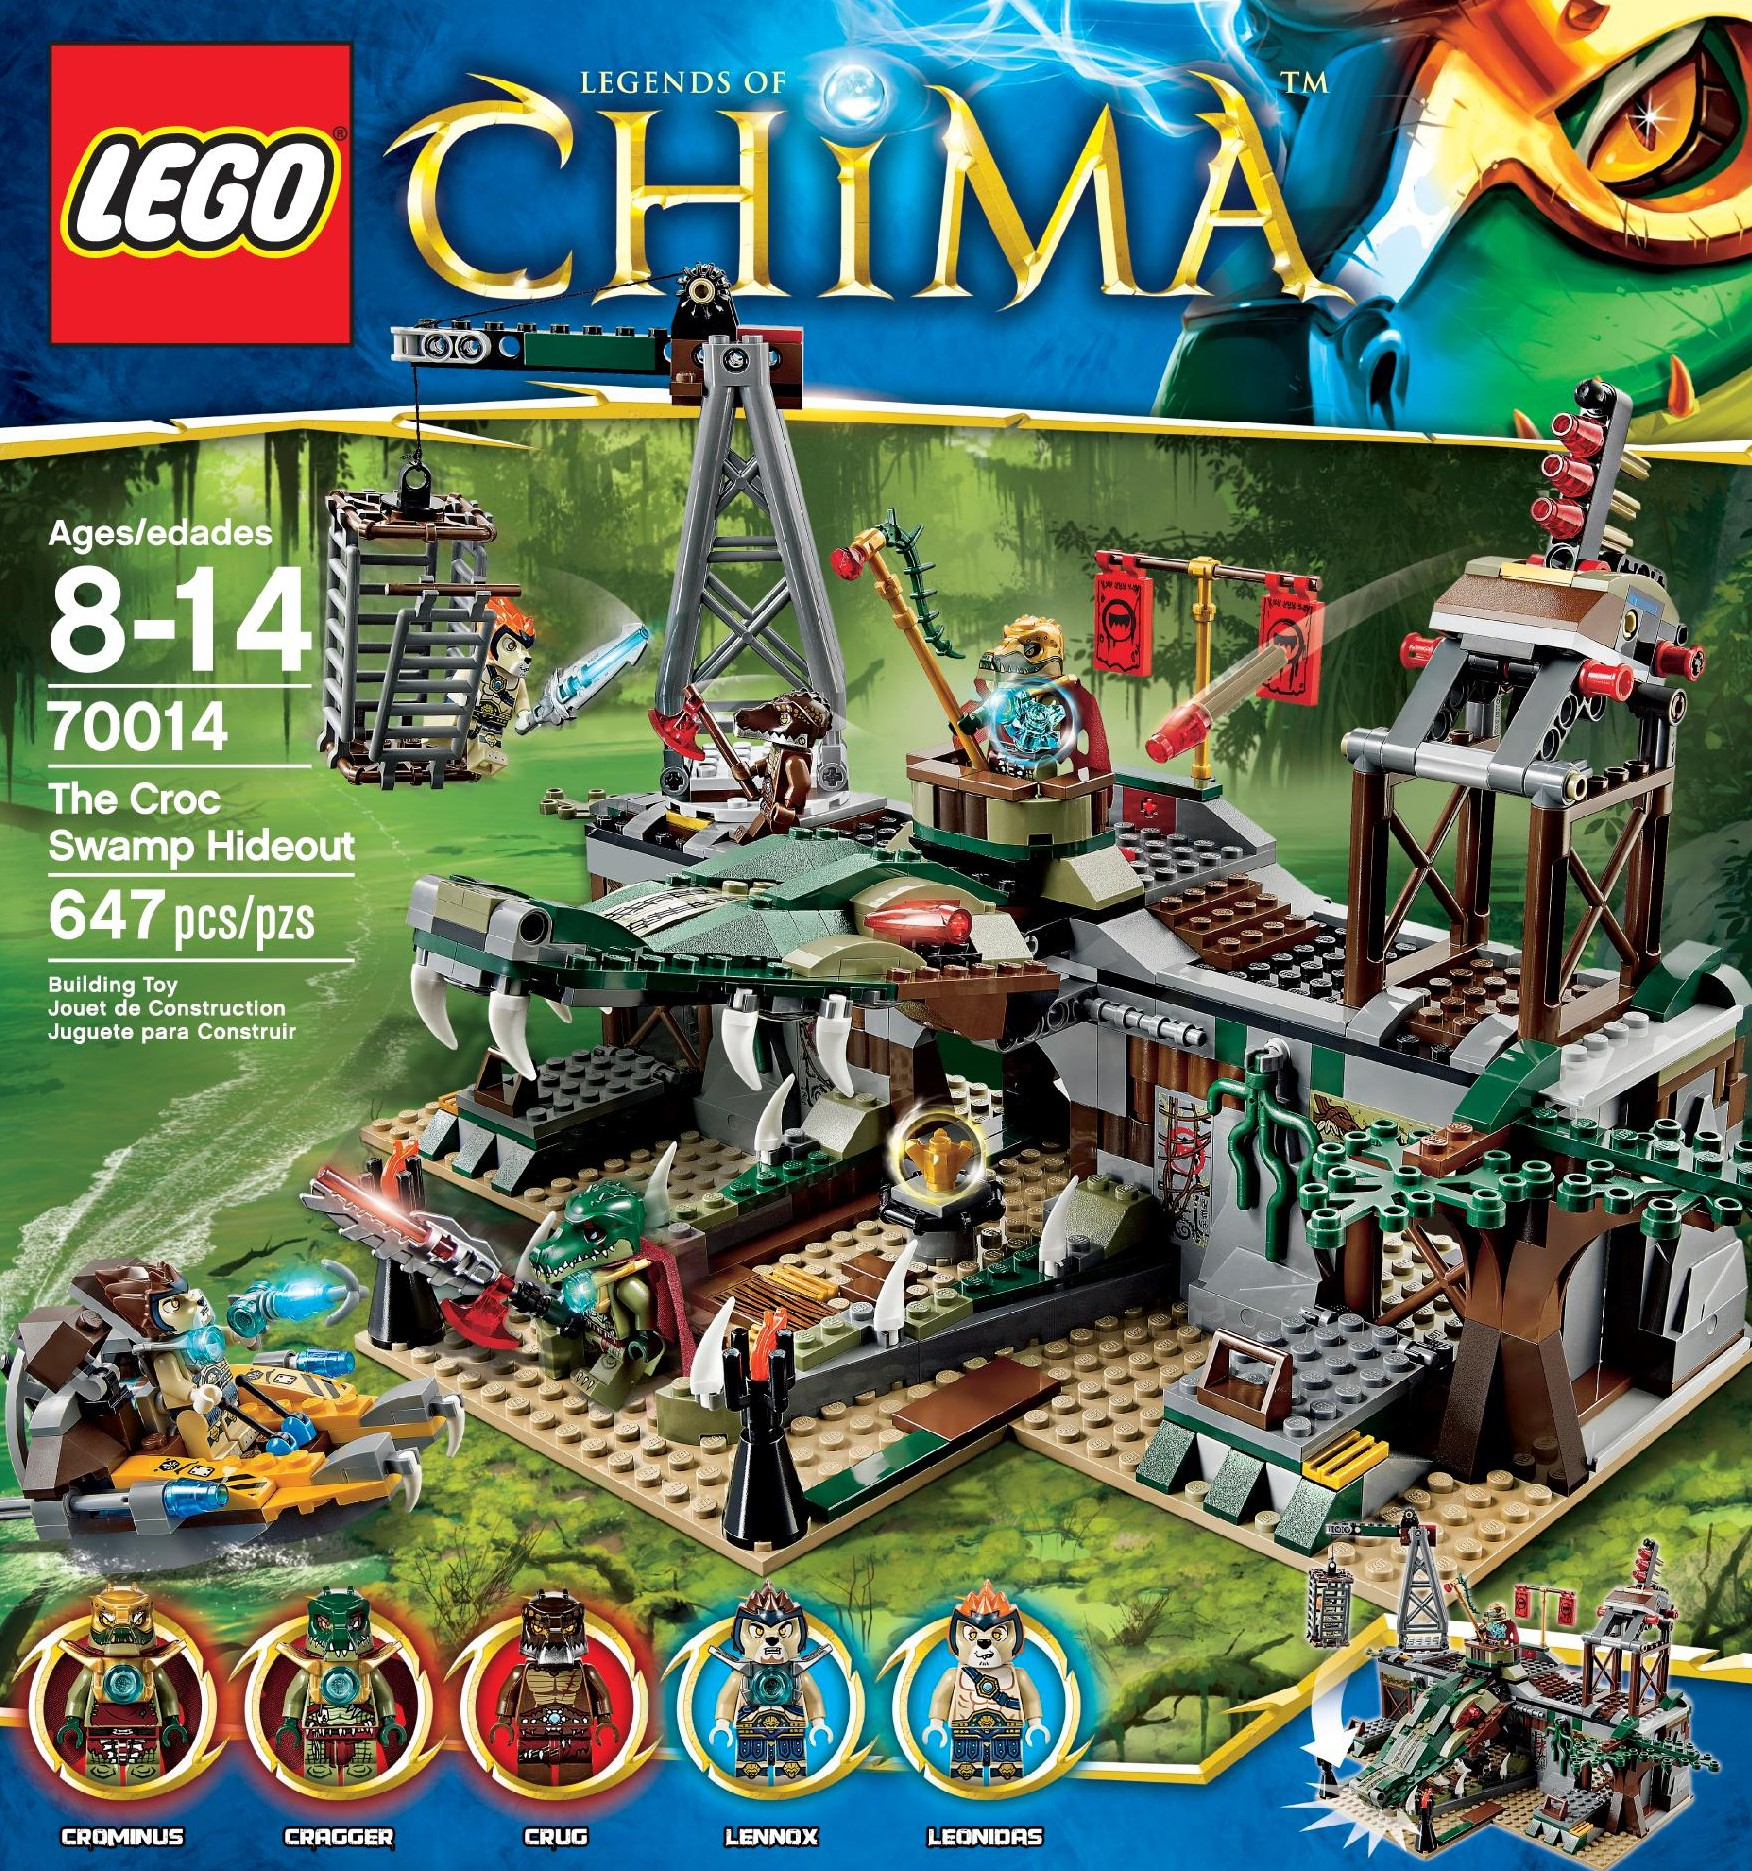 Lego Chima Croc Swamp Hideout 70014 Summer 2013 Set